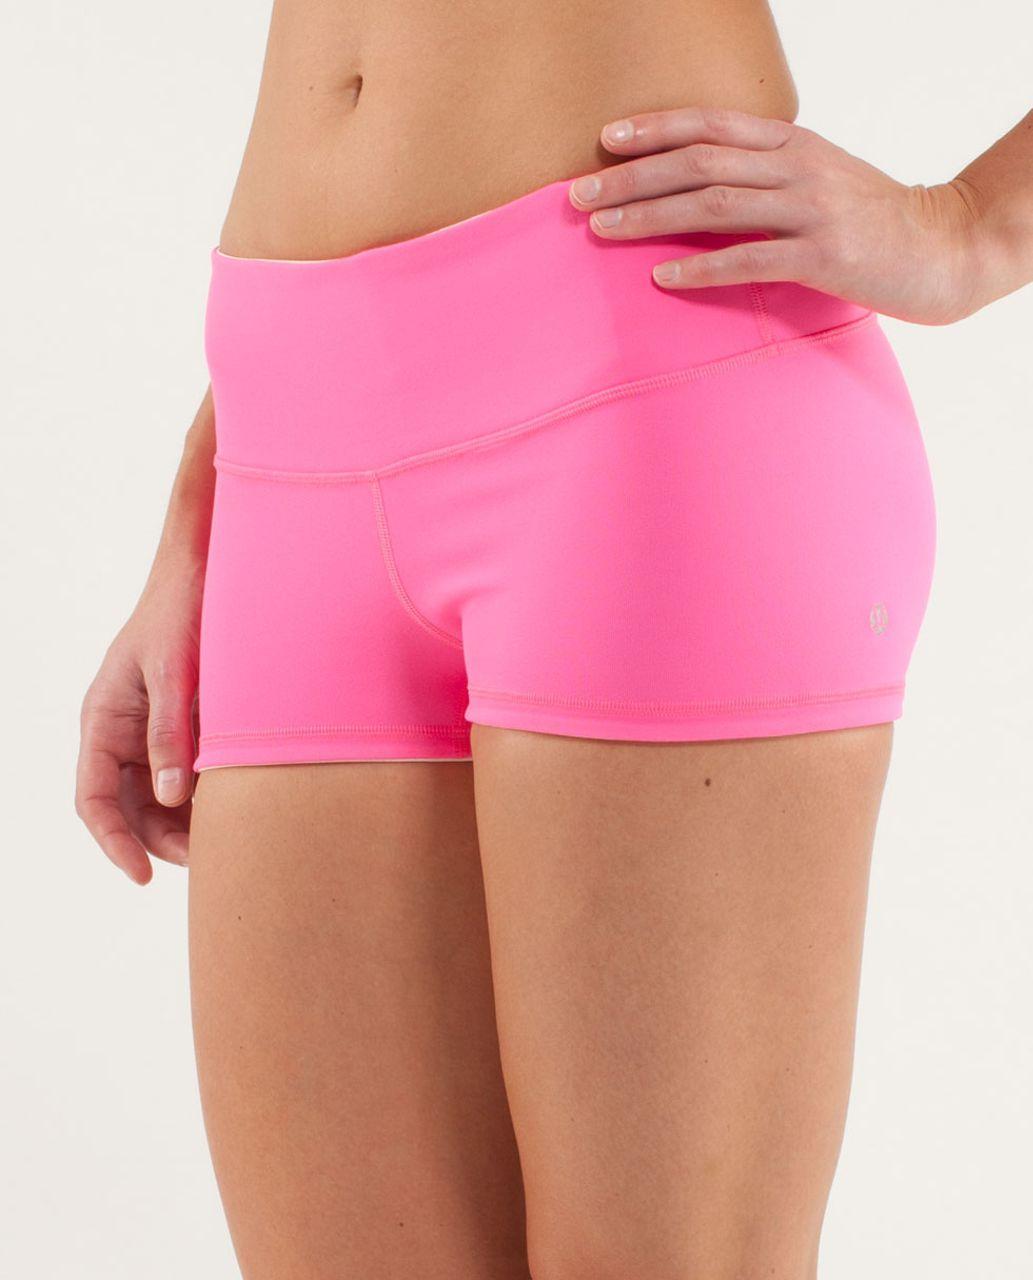 Lululemon Boogie Short - Parfait Pink / Pinkelicious